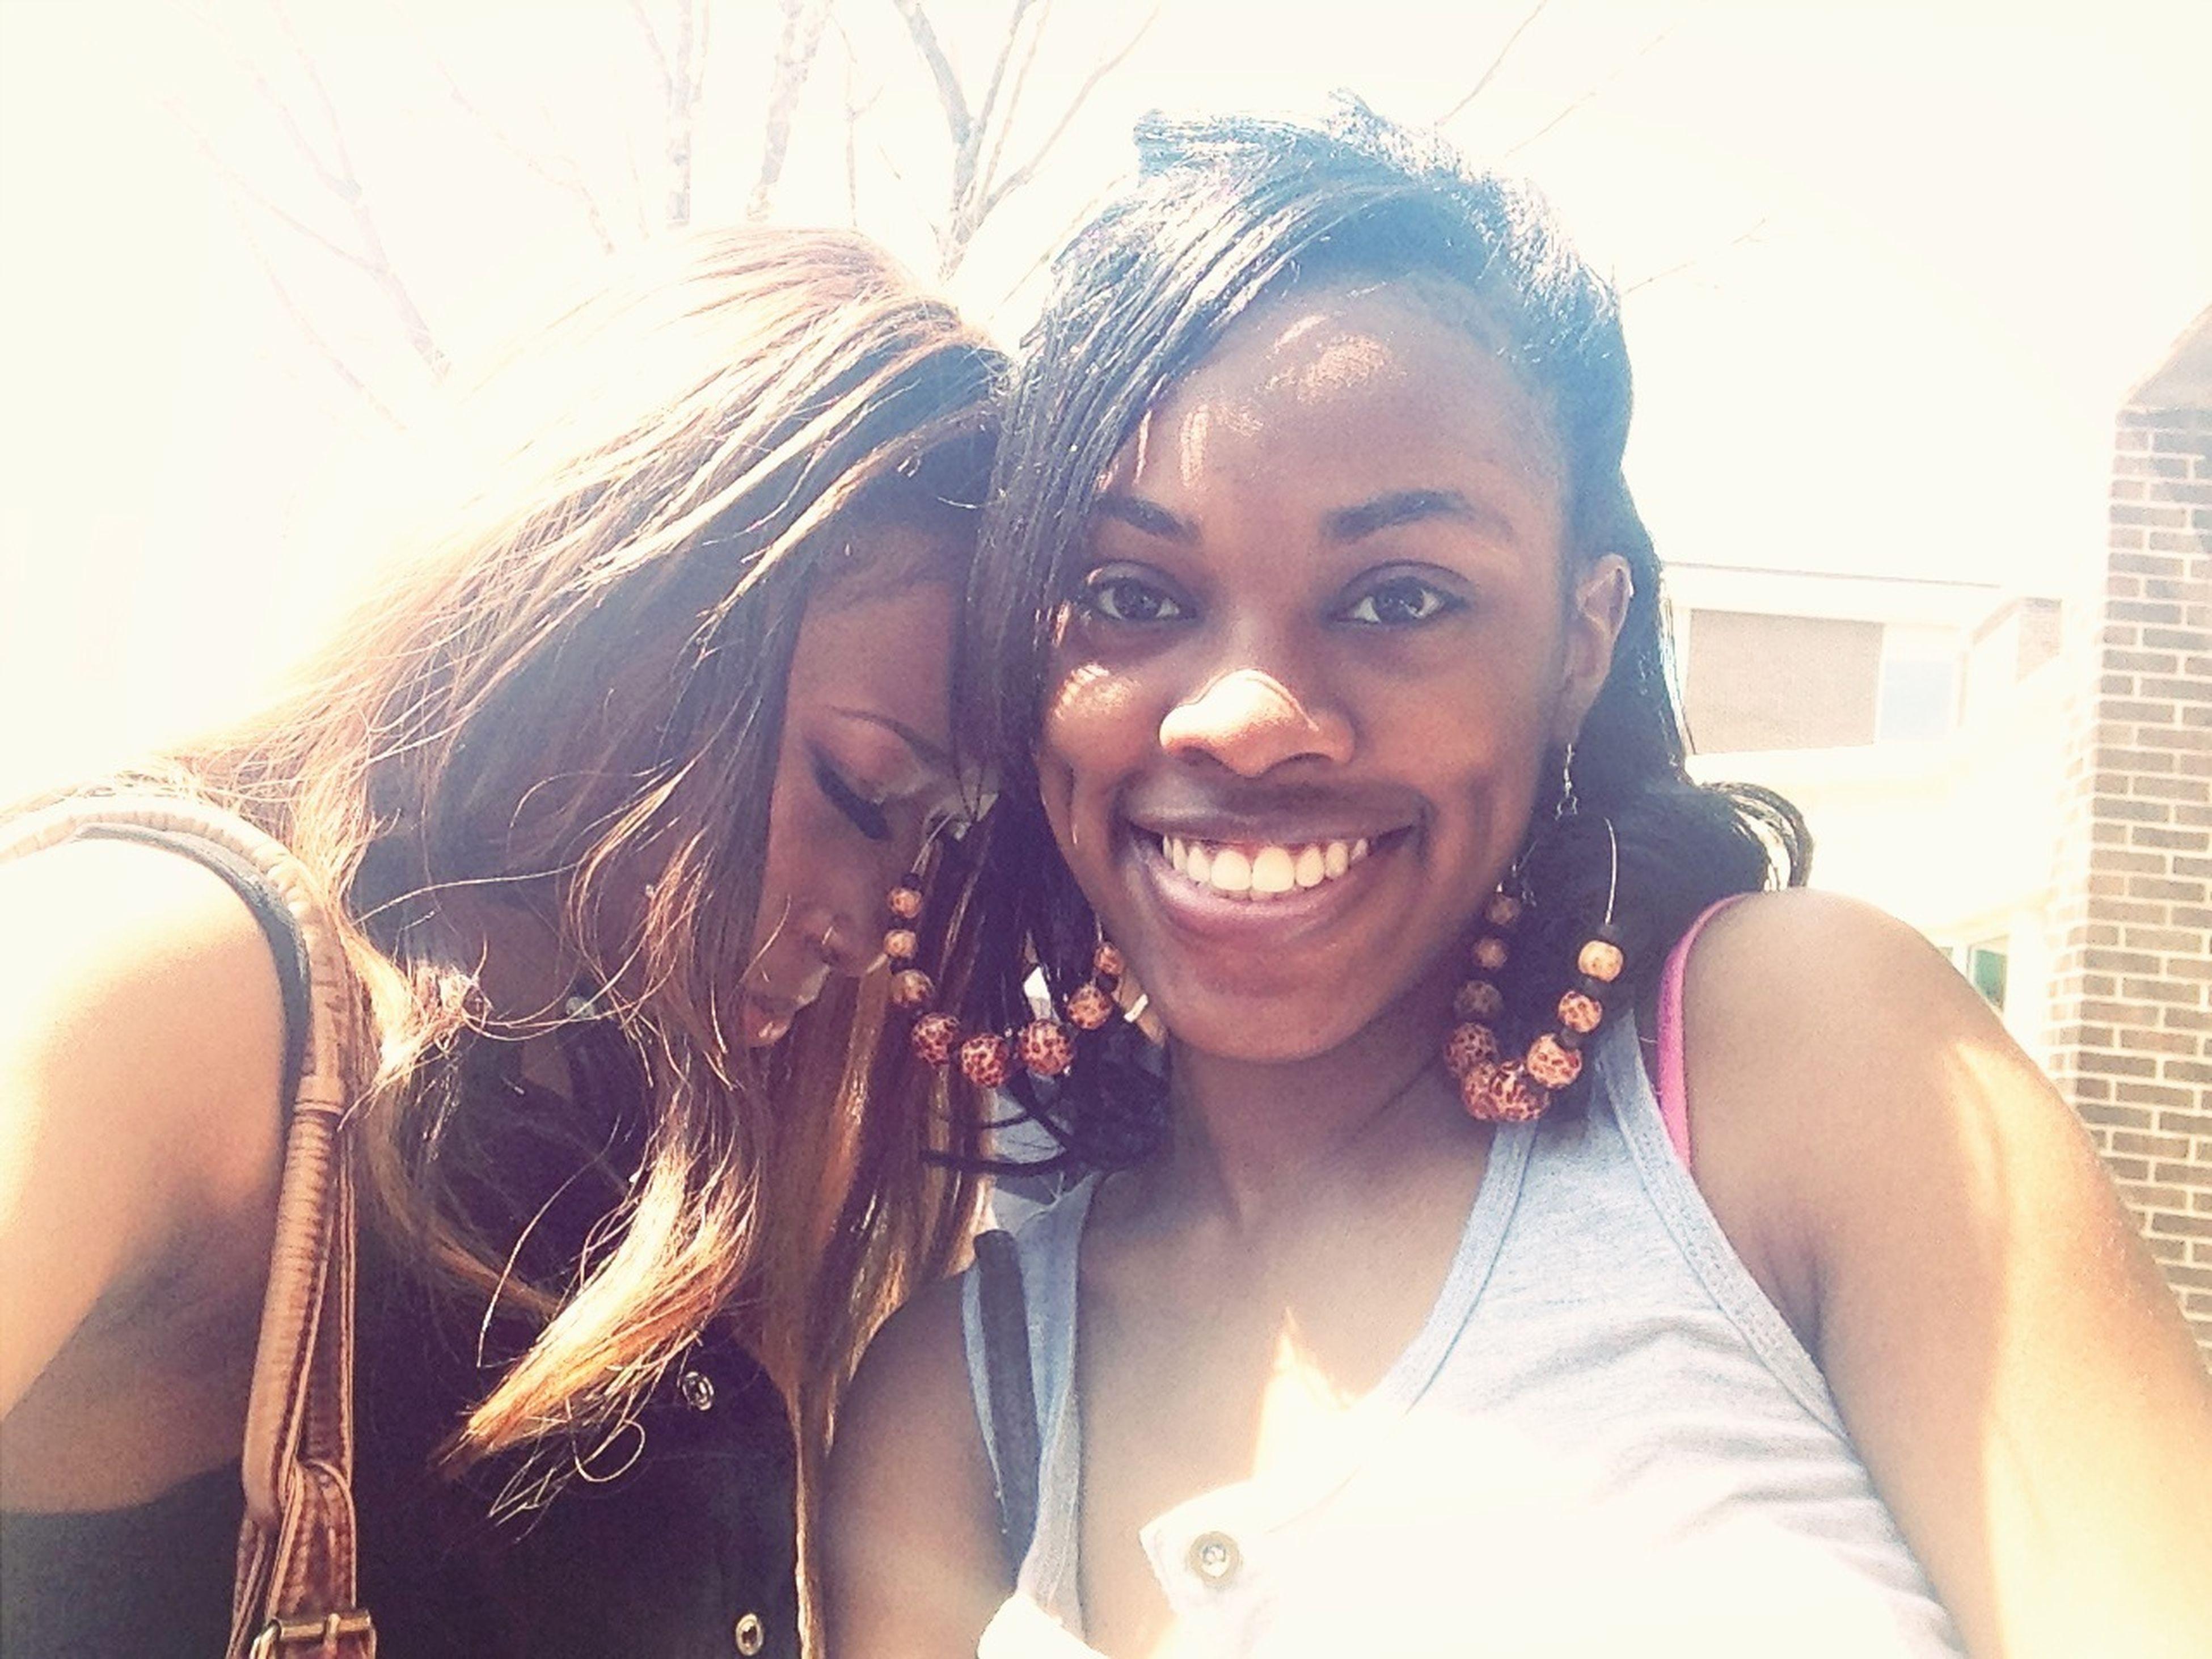 Me And My Twerksome Sosa ❤